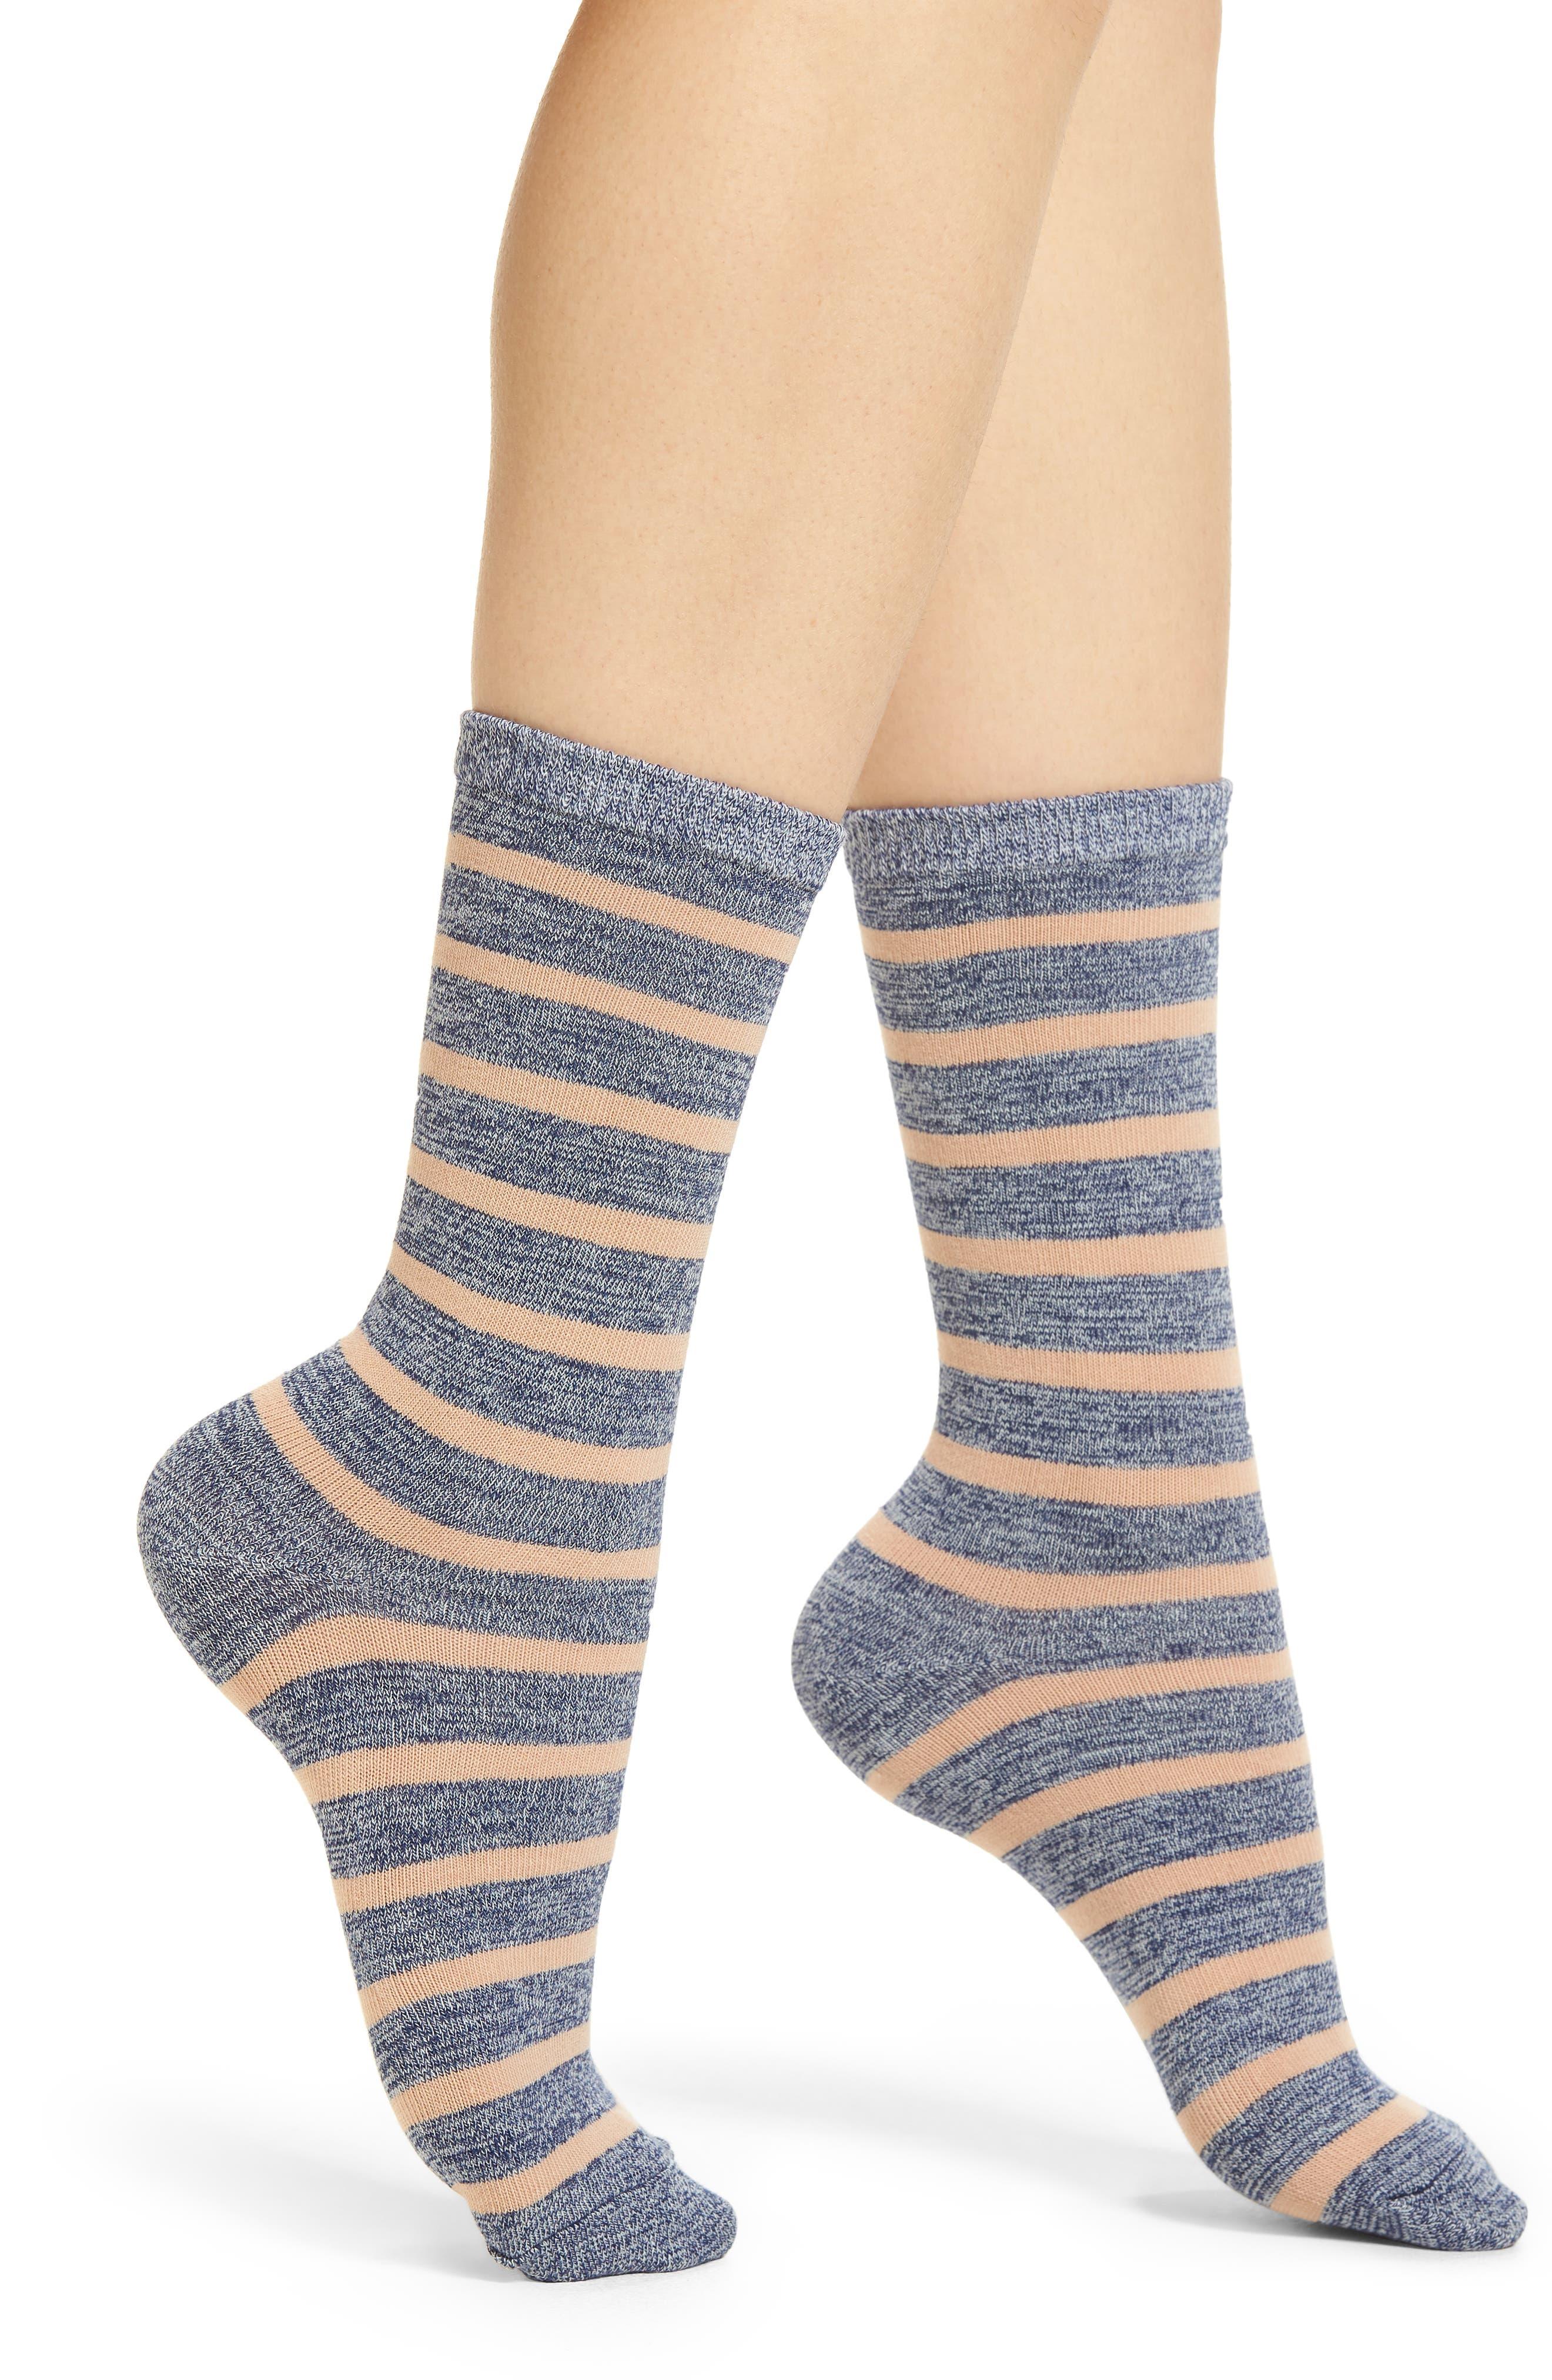 Richer Poorer Nora Classic Crew Socks